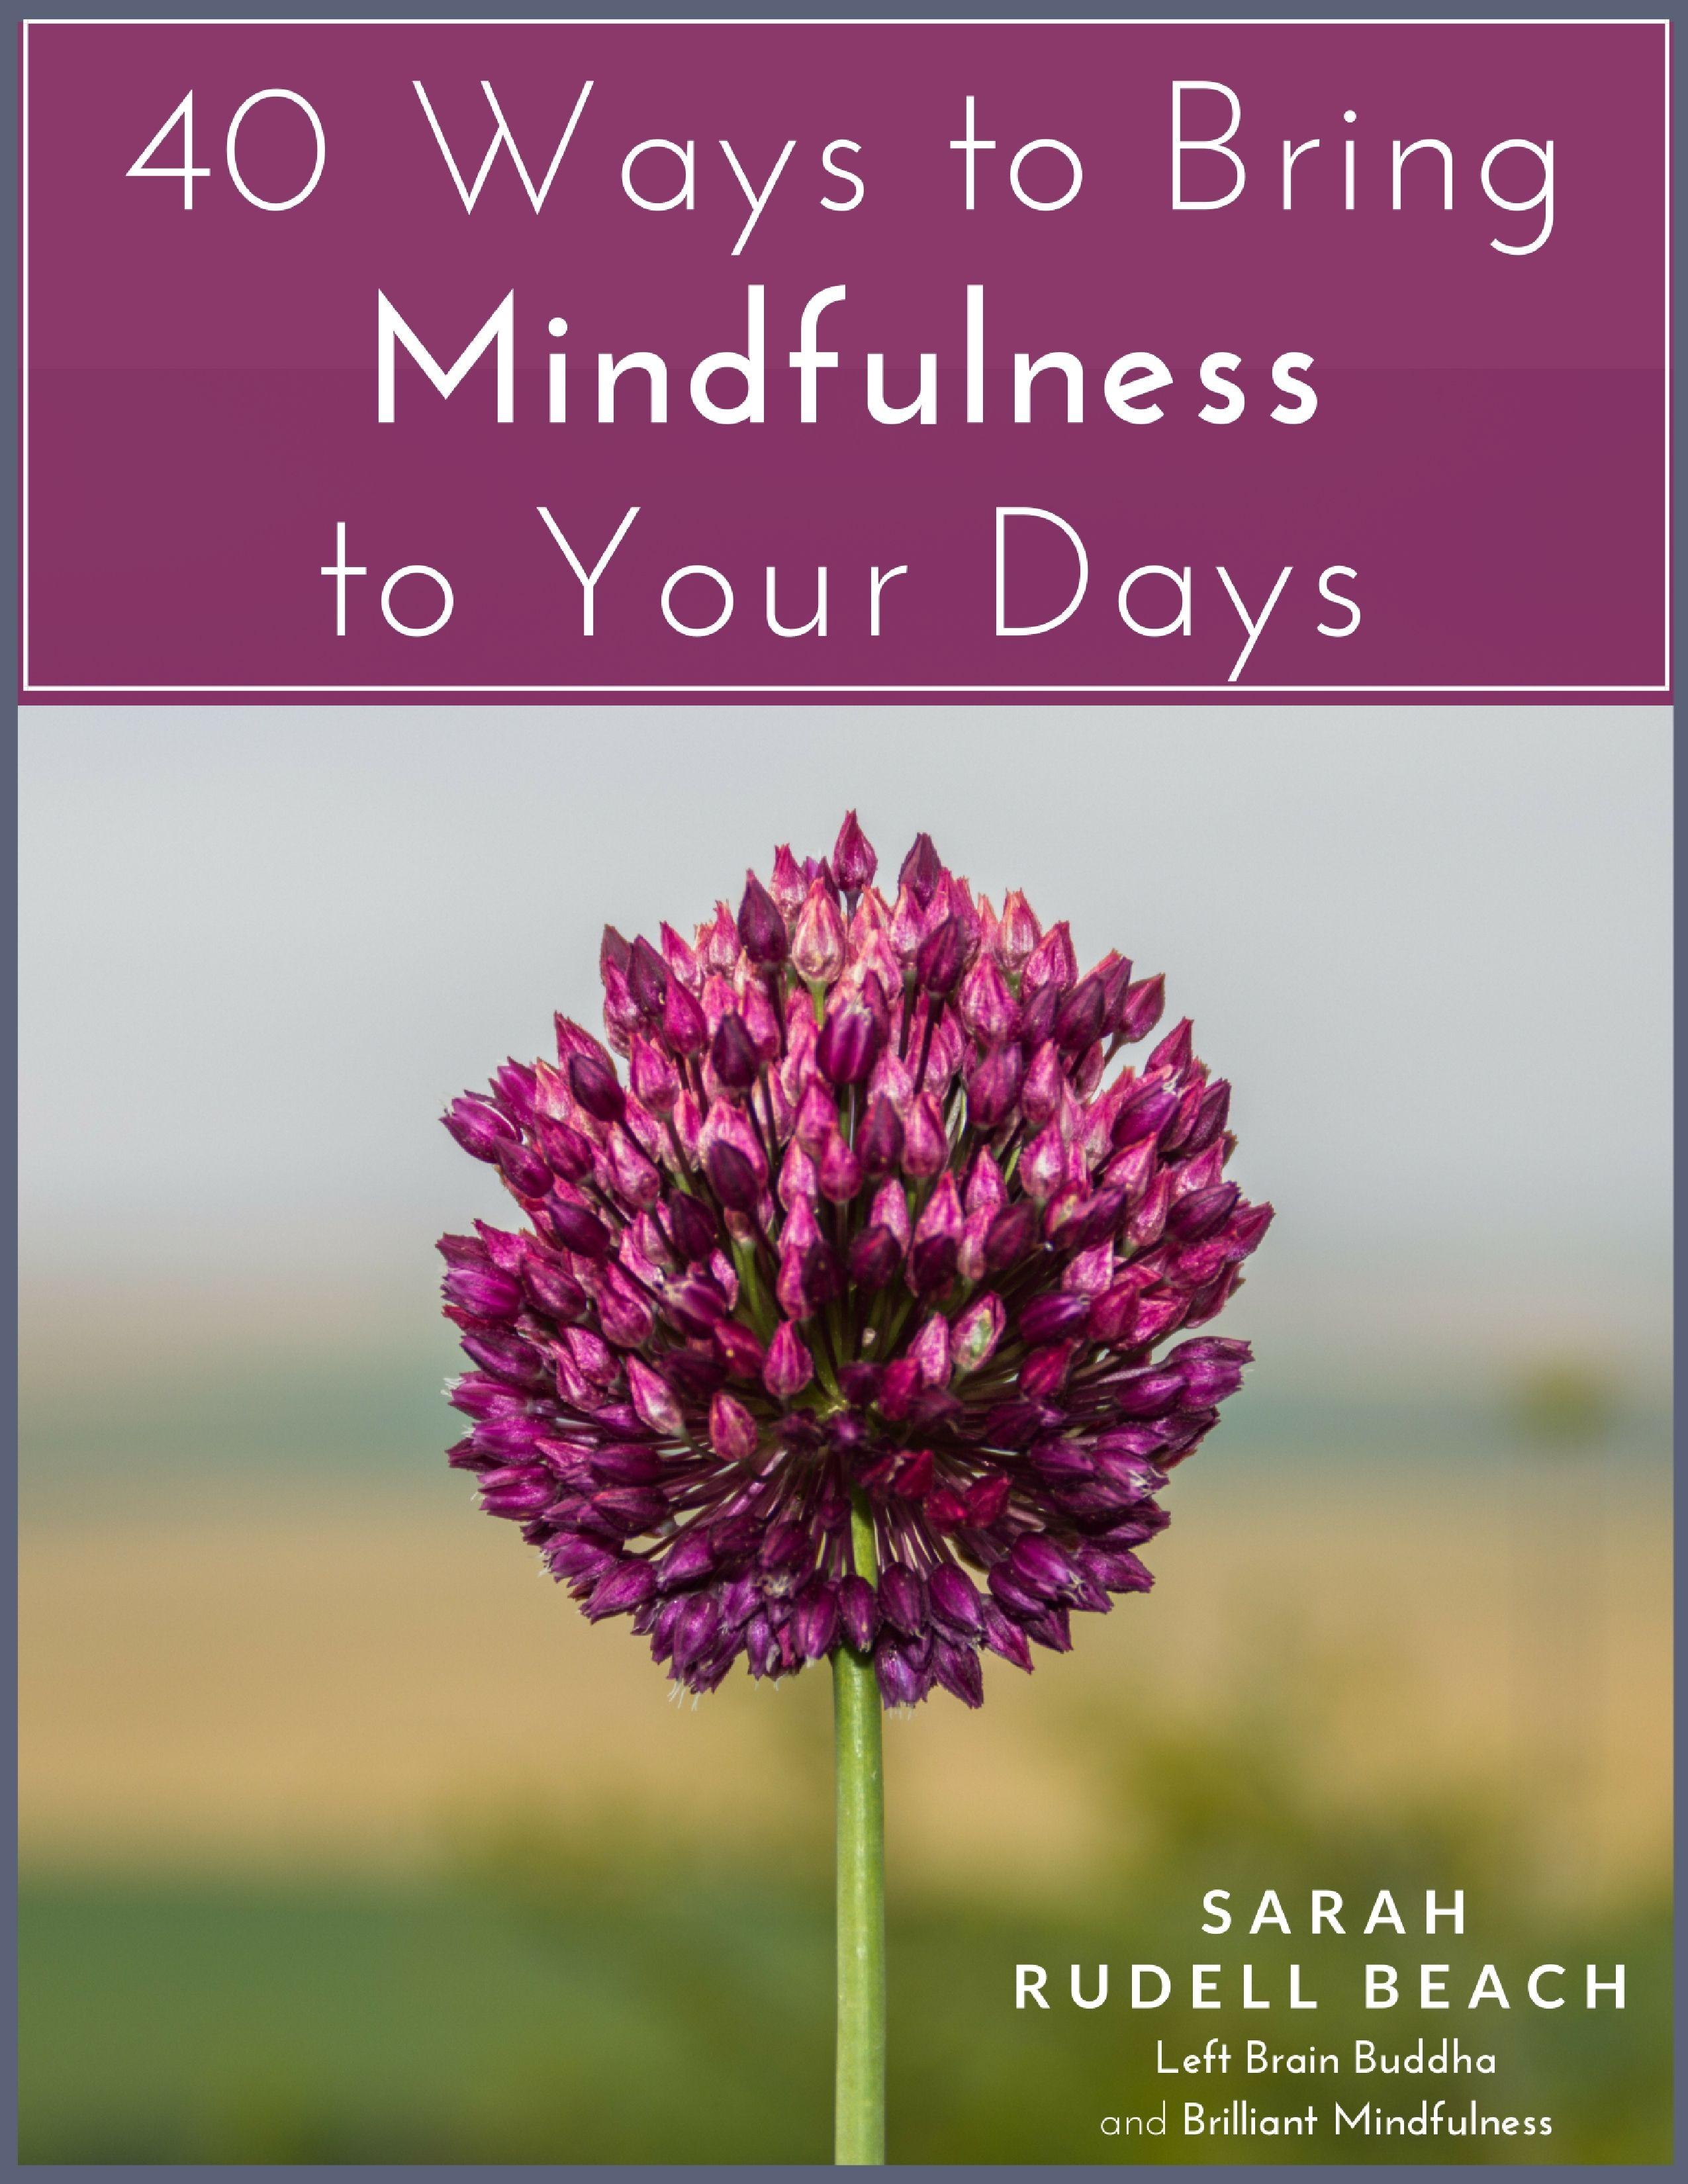 10 Ways to Teach Mindfulness to Kids - Left Brain Buddha